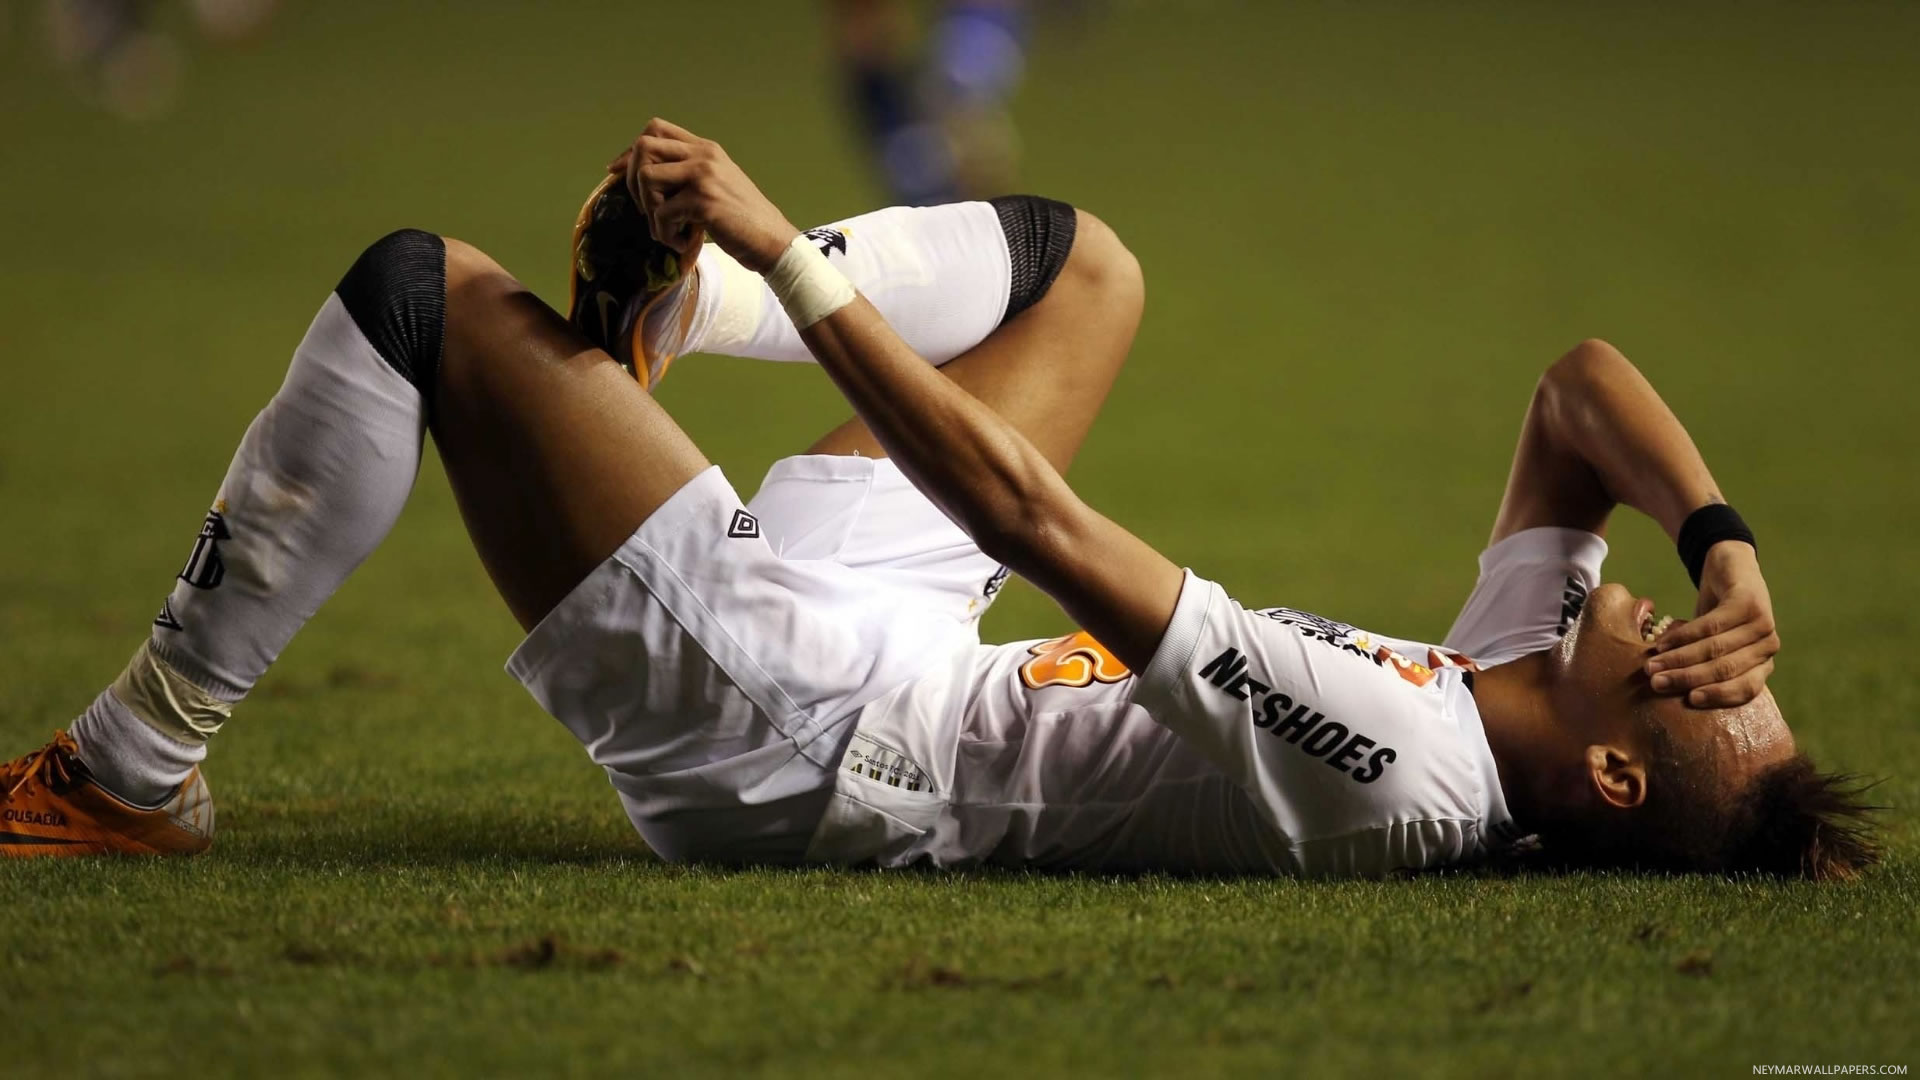 Neymar lying hurt wallpaper